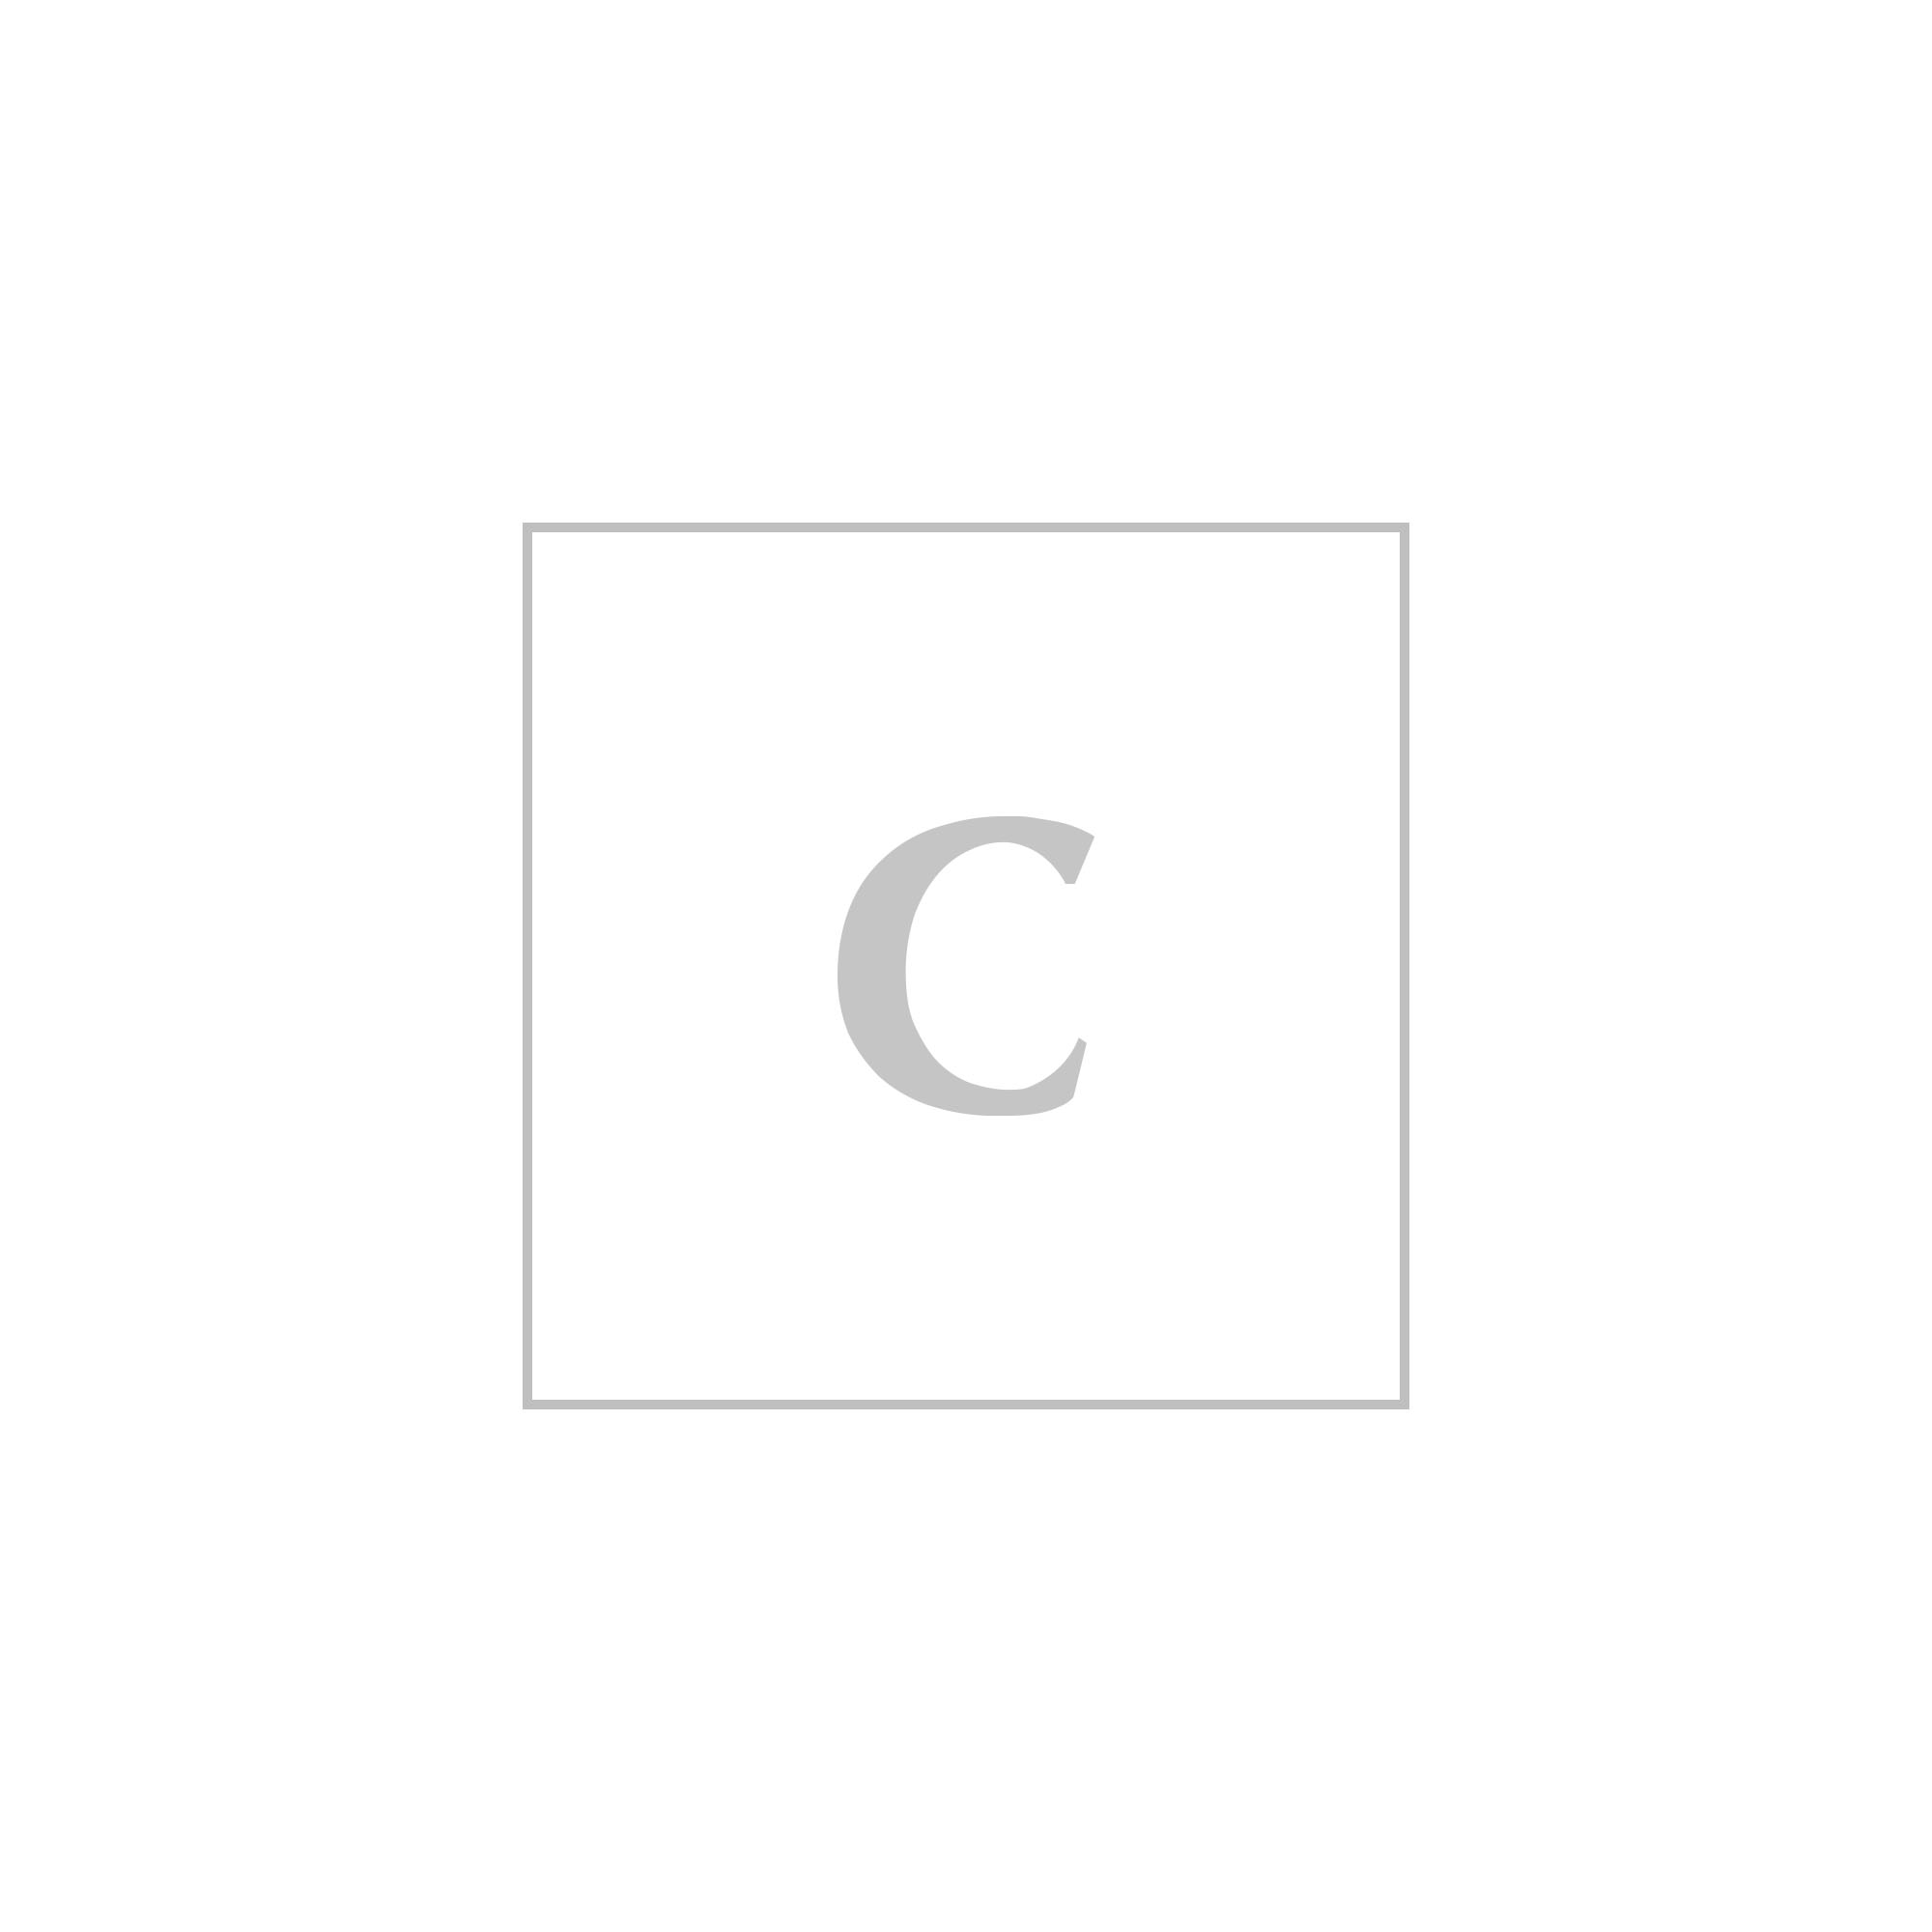 Dolce & gabbana borsa mini stampa dauphine laminata